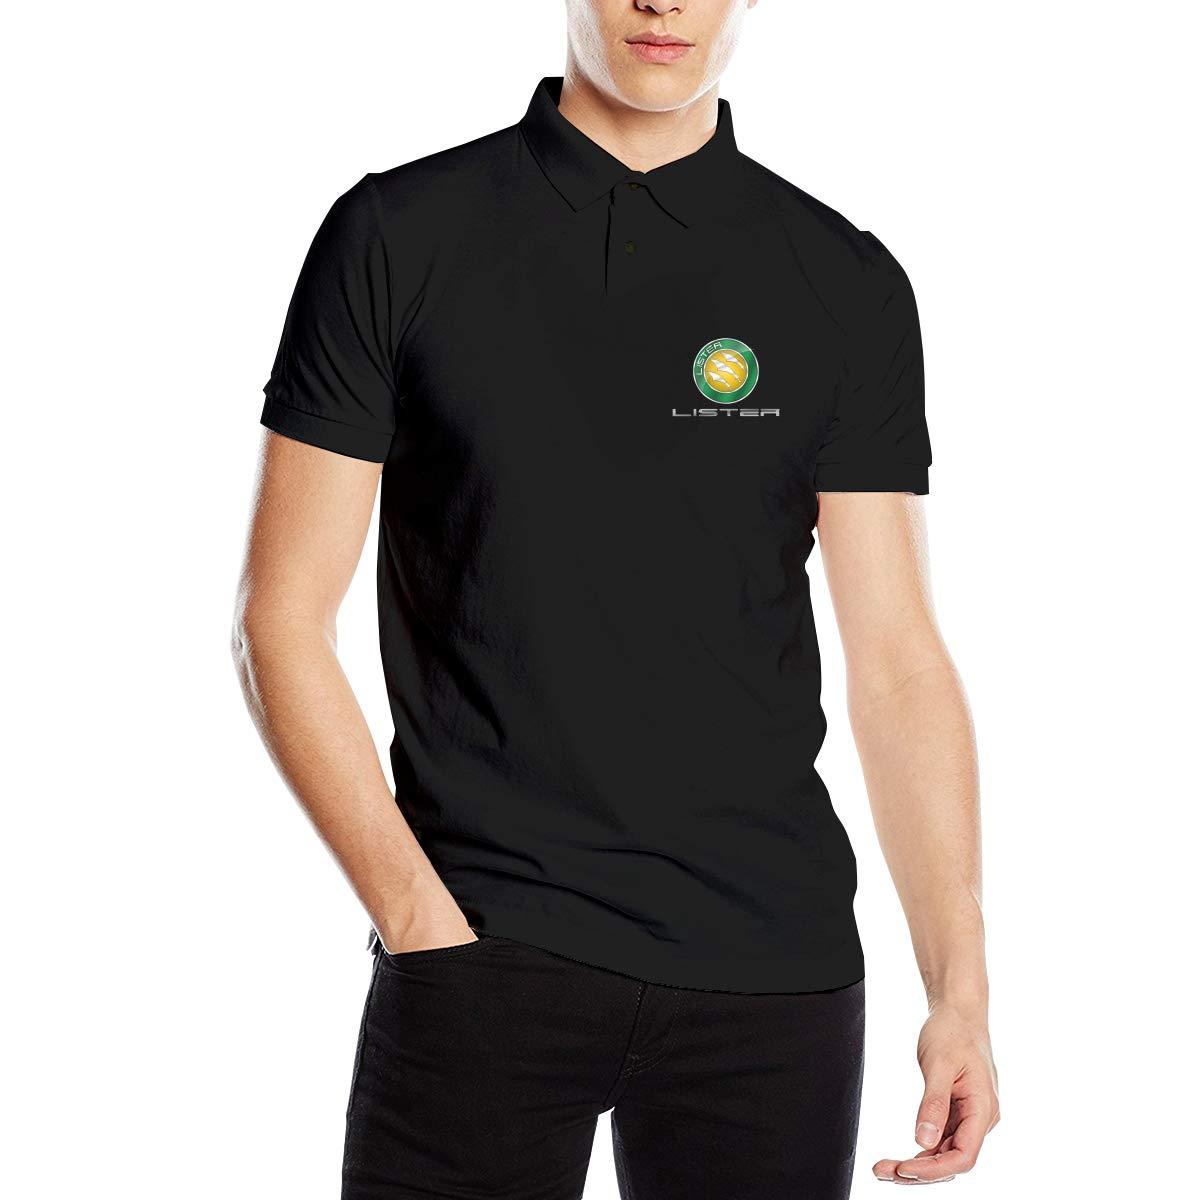 HANRUI Personalized Lister Motors Logo New Polo T-Shirt for Men 100/% Organic Cotton Short Sleeve White